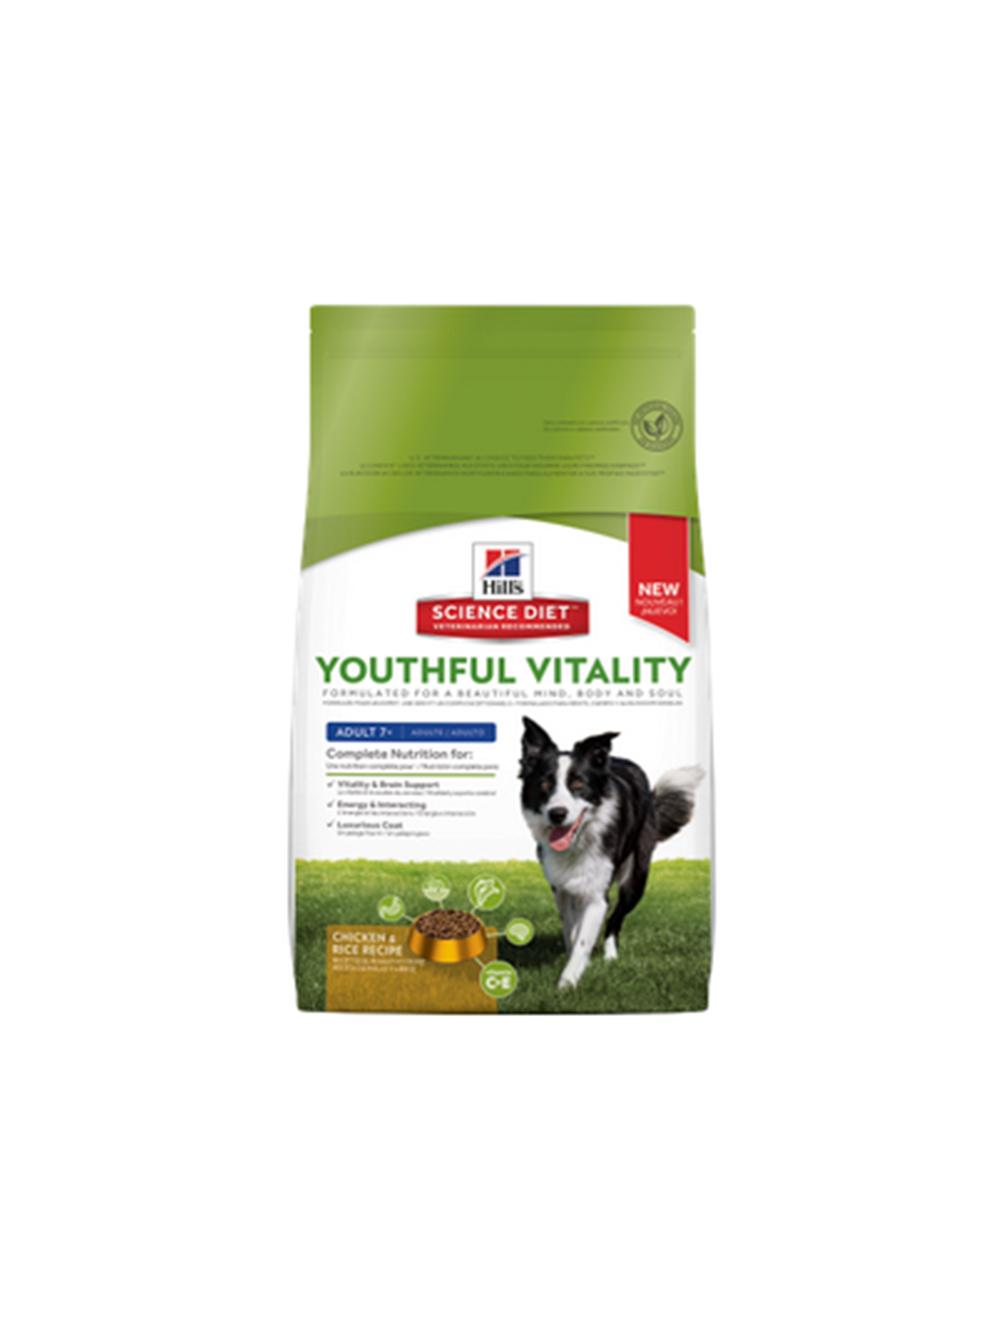 Hills Perro Youthfull Vi Ad 7+ Chicken &Rice 1.58K - PRSR